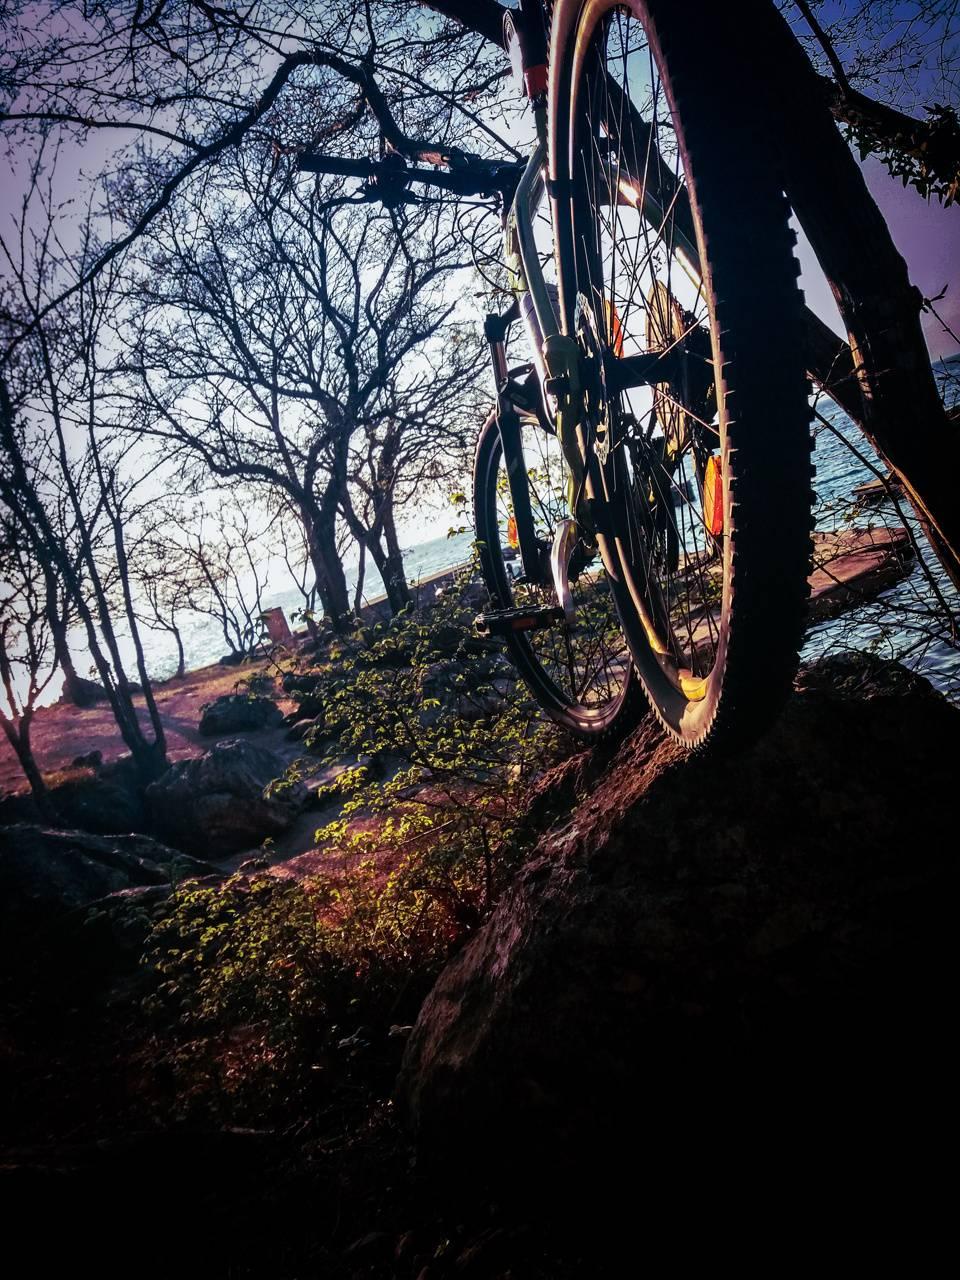 A wild mountain bike